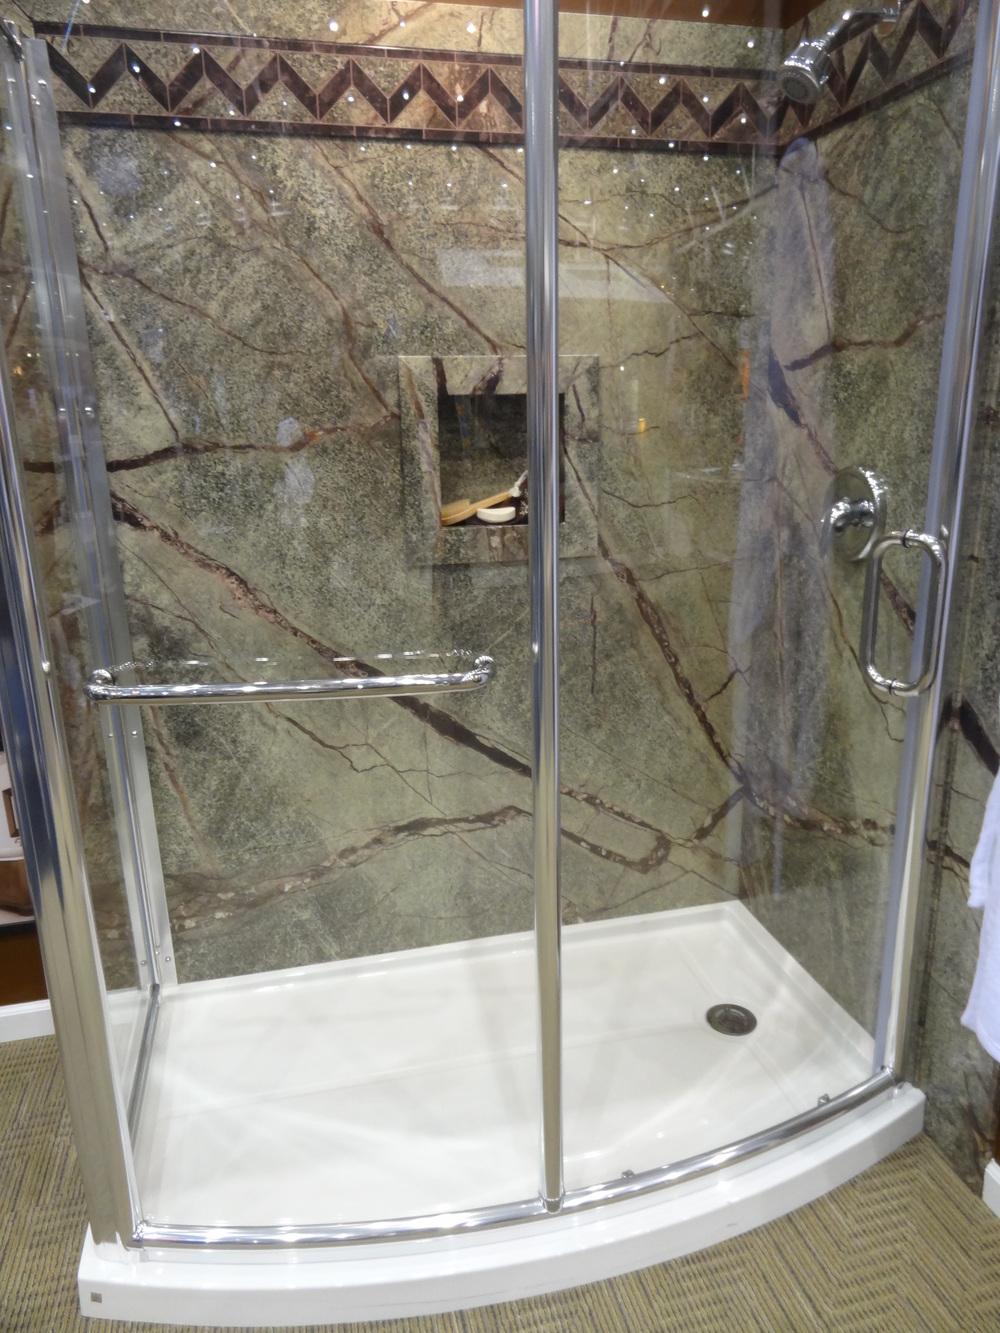 curved glass enclosure acrylic base lowes bathtub shower units diy bathroom remodel and lowes